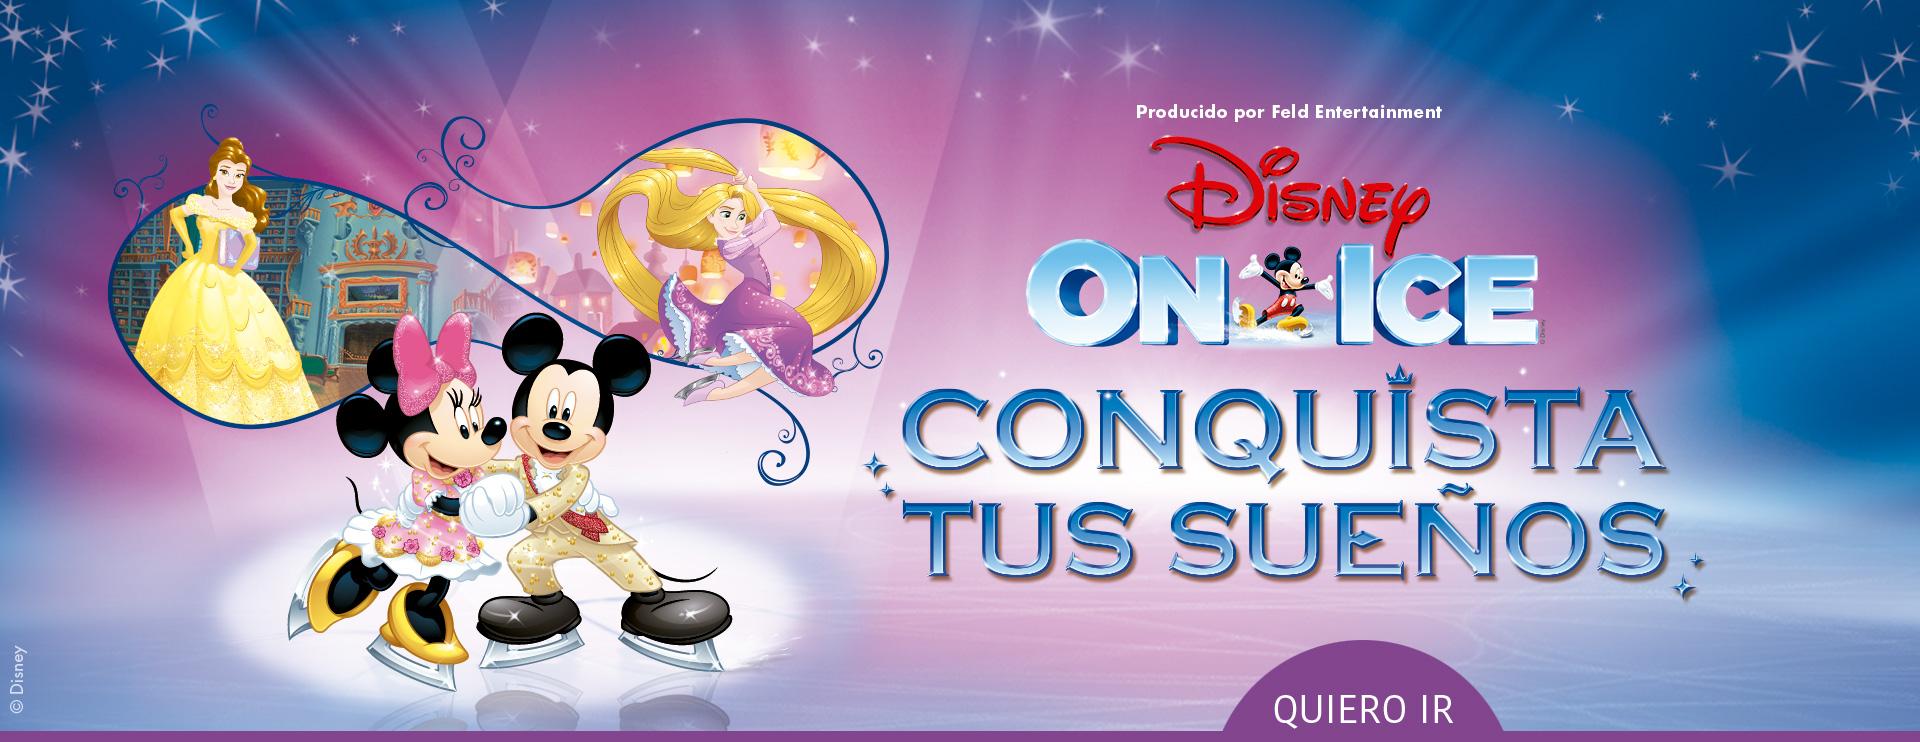 Disney on Ice - Conquista tus sueños